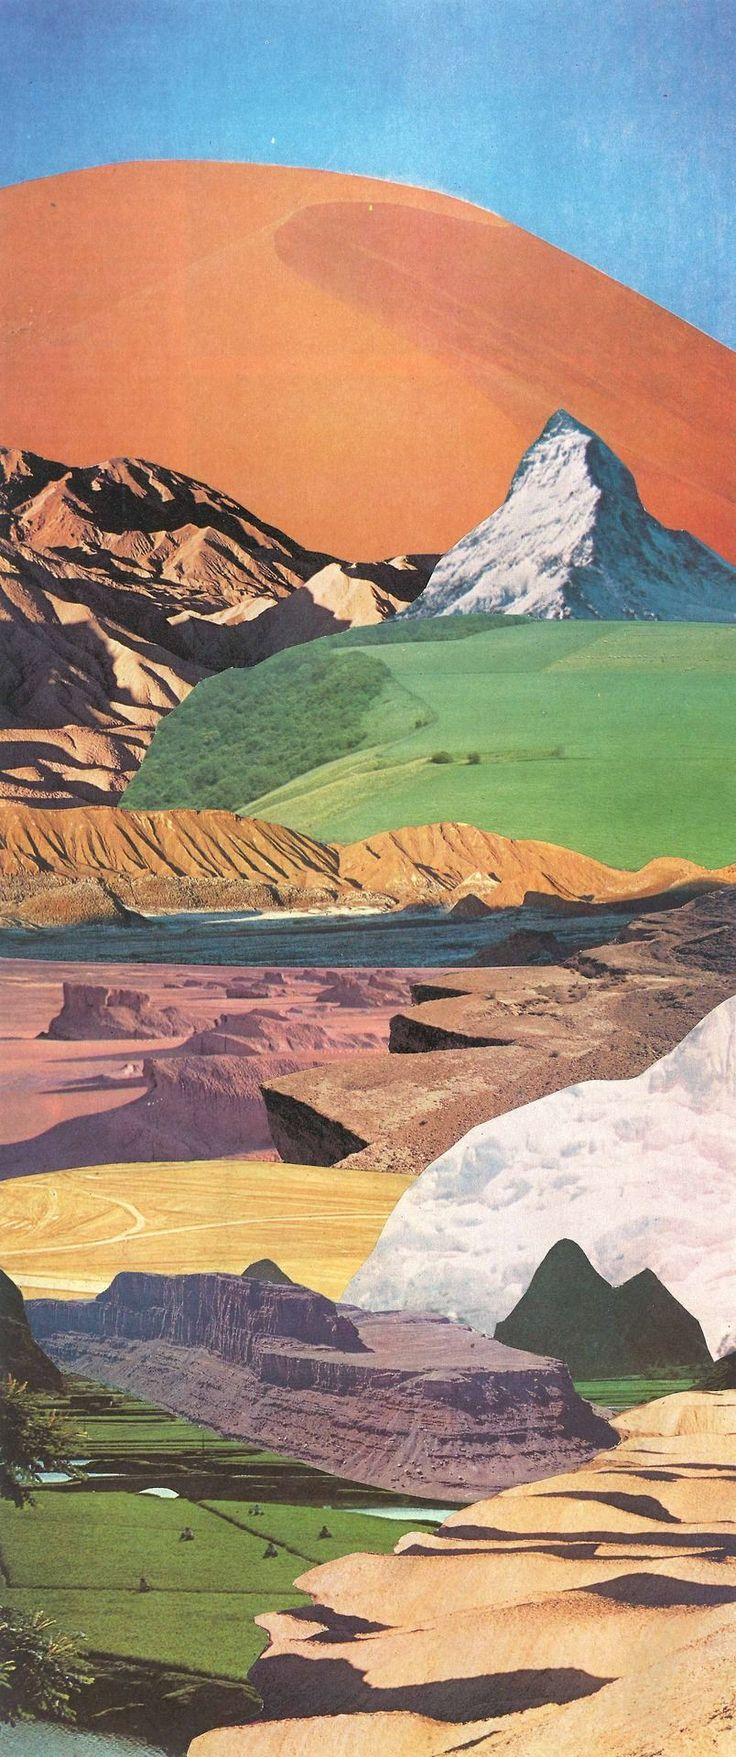 collage by jesse treece #LandscapeCollage